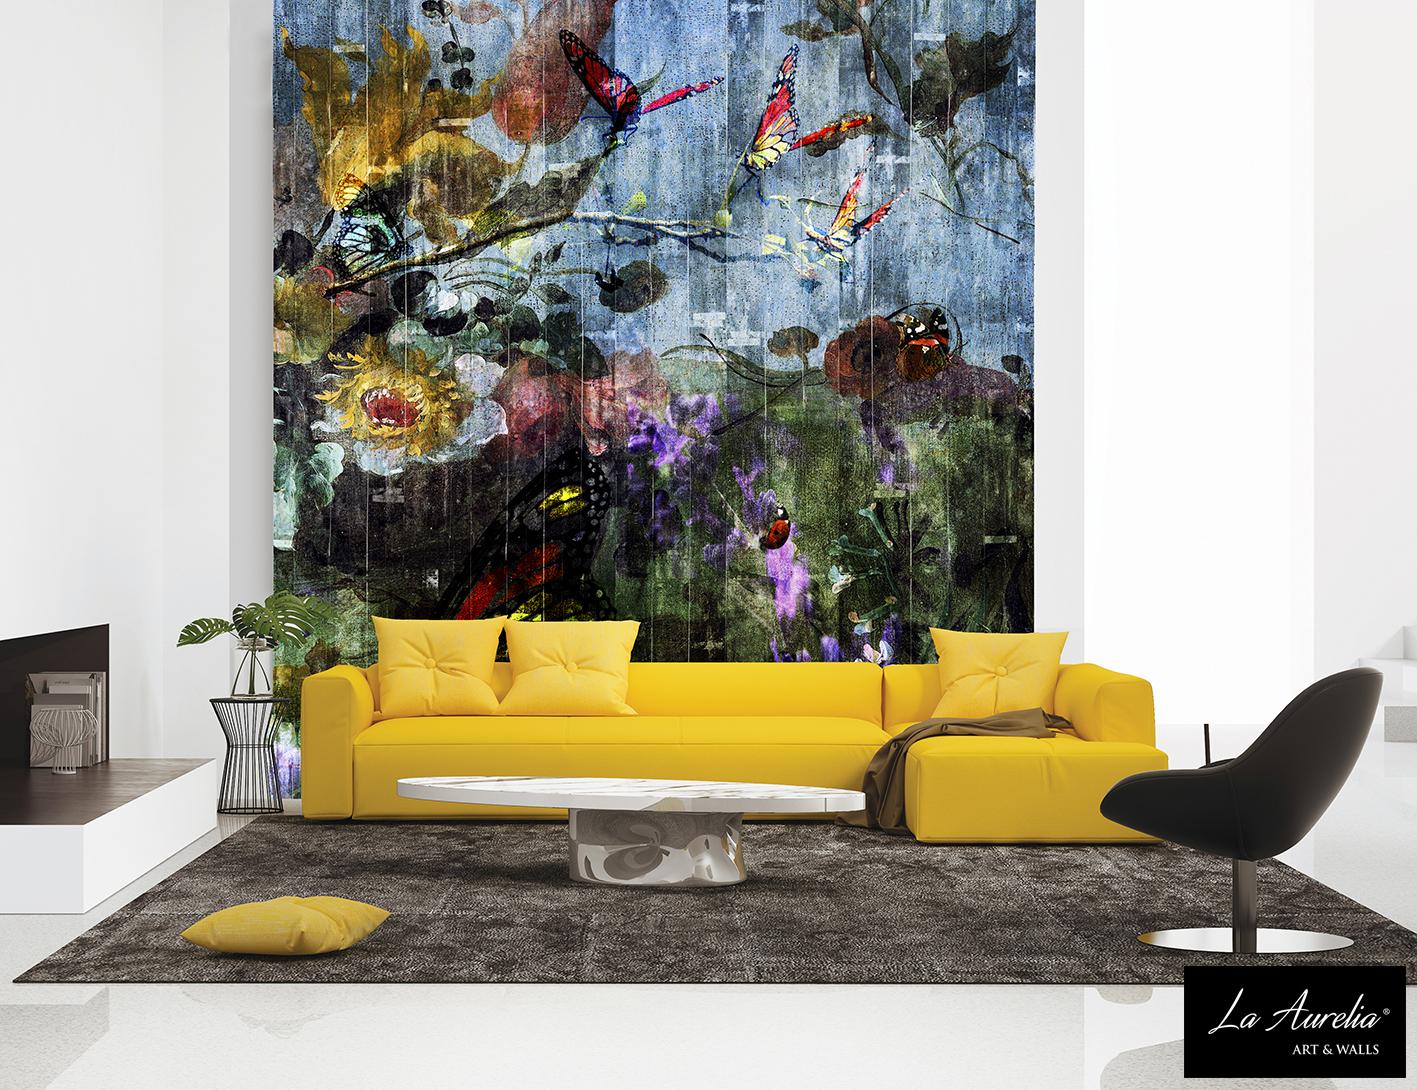 Butterfly Garden, a wallpaper from the Dutch Dreams wallpaper collection by La Aurelia